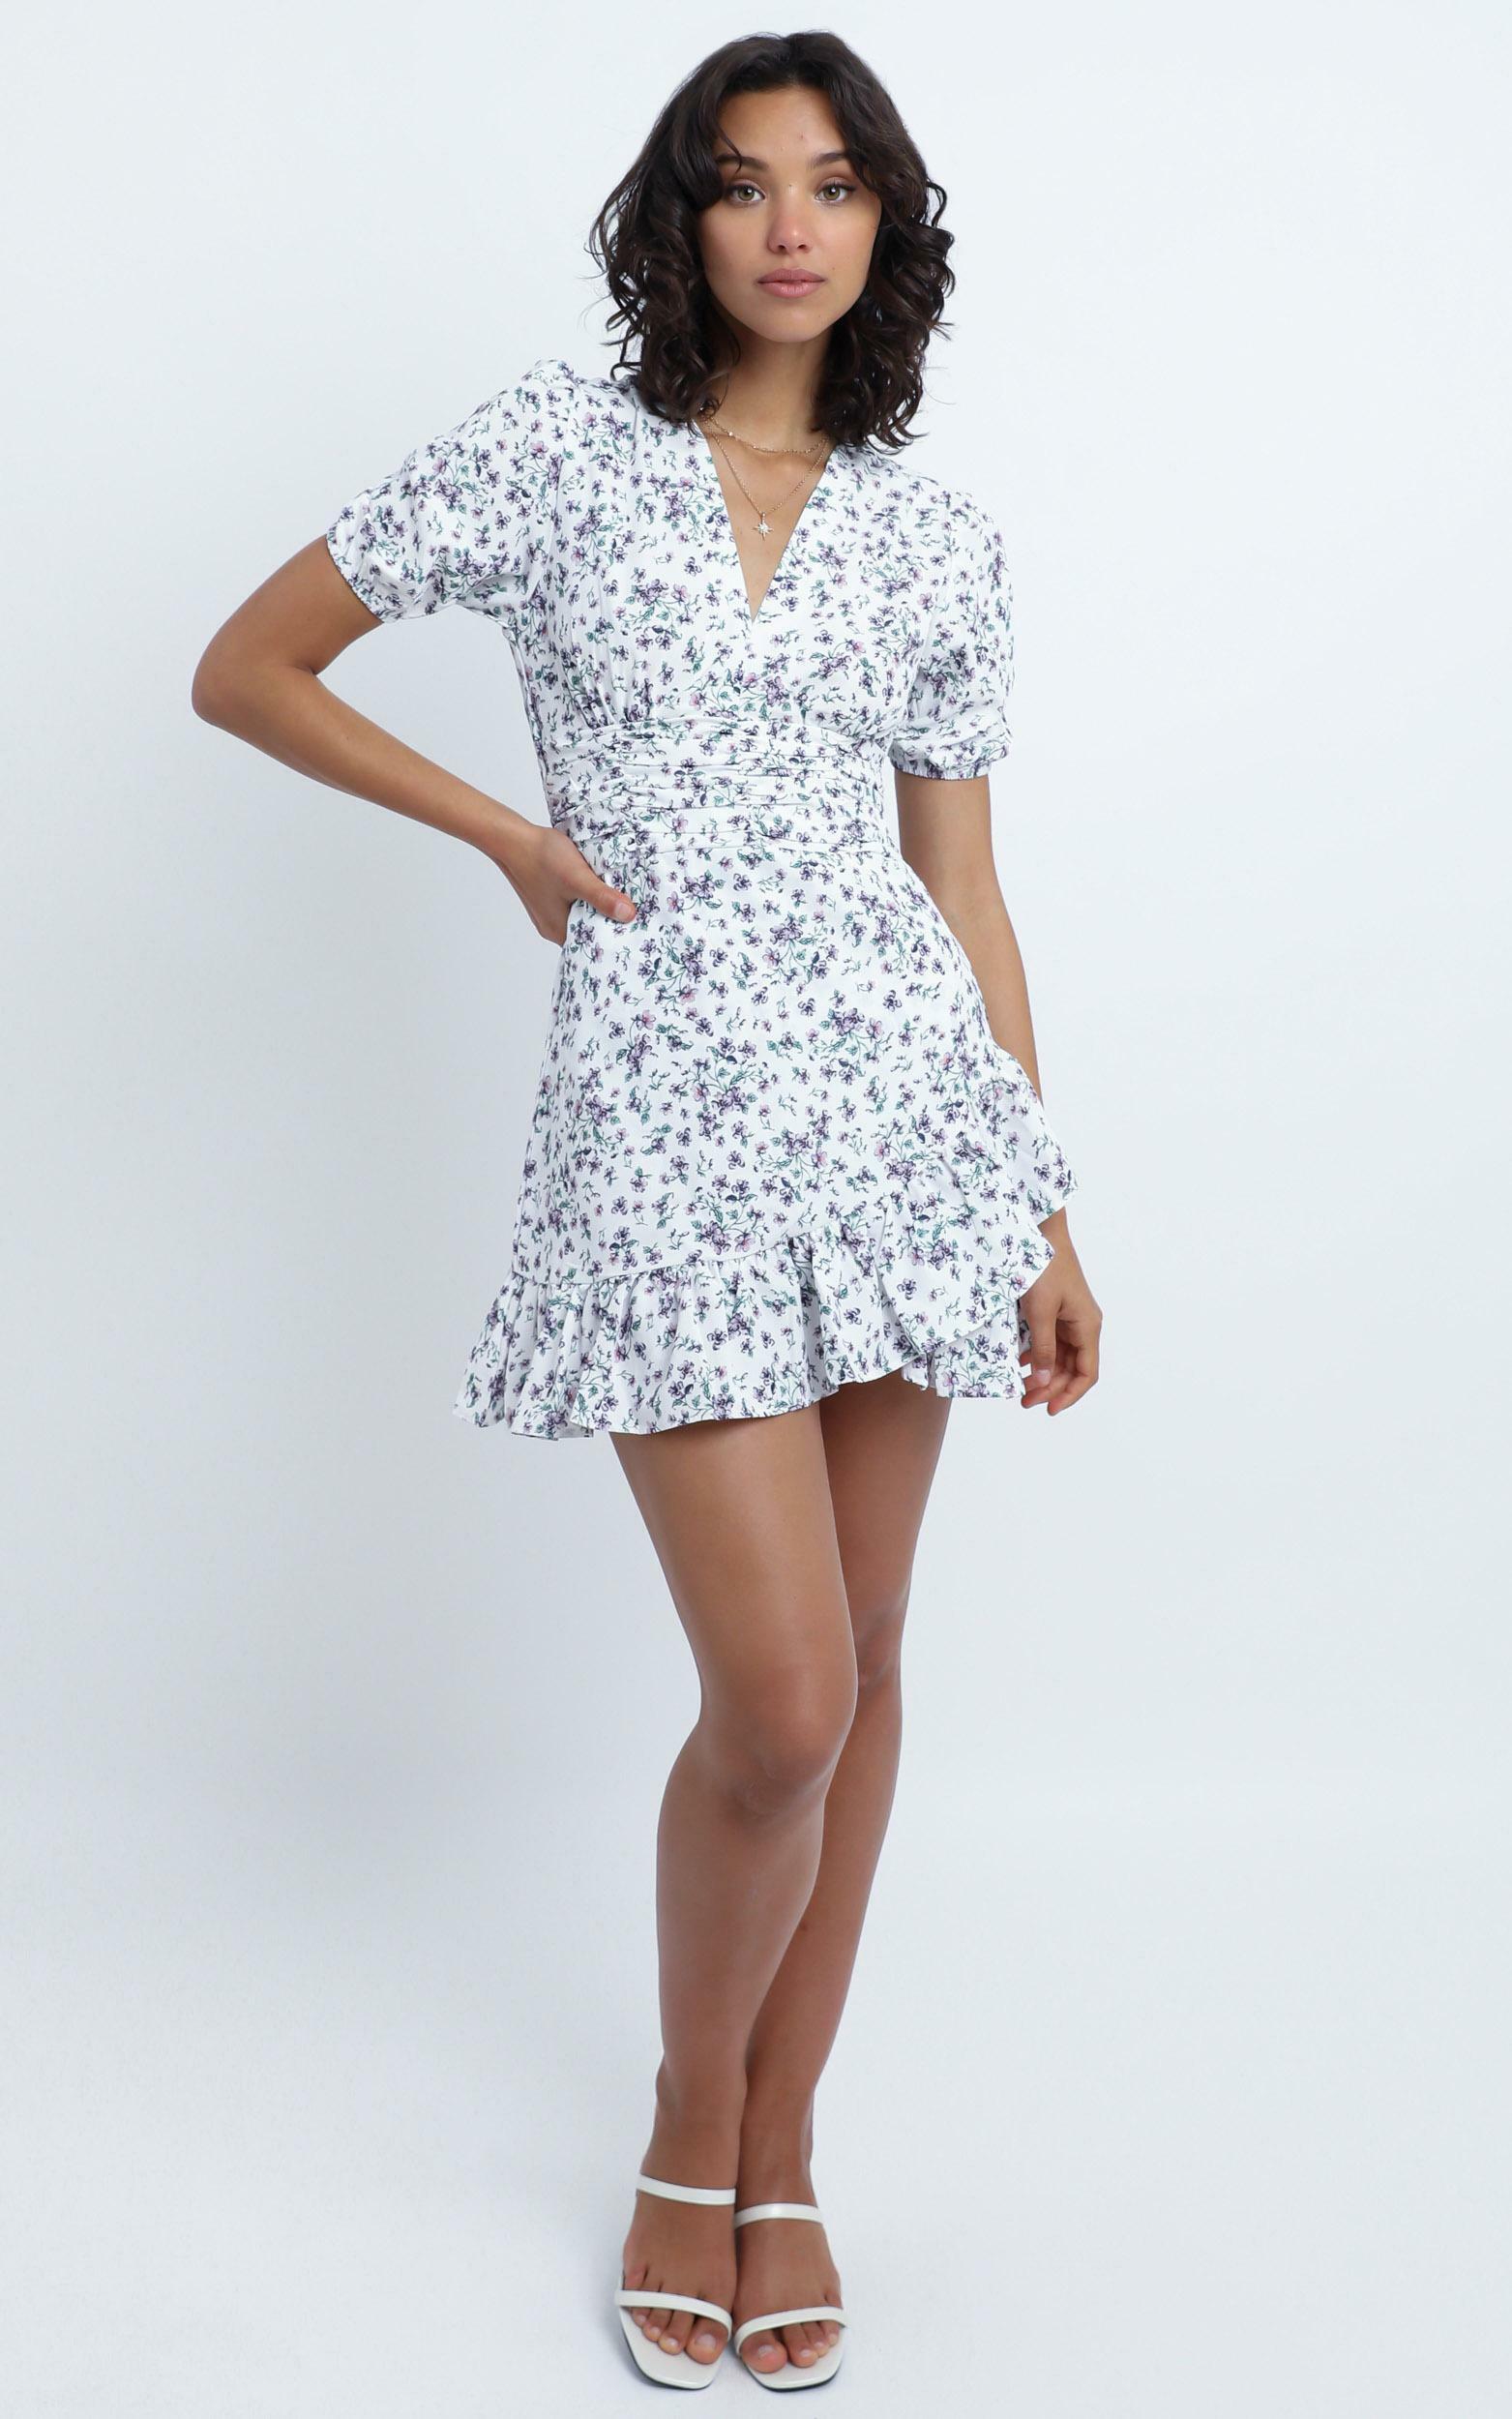 Kella Dress in White Floral - 12 (L), WHT1, hi-res image number null